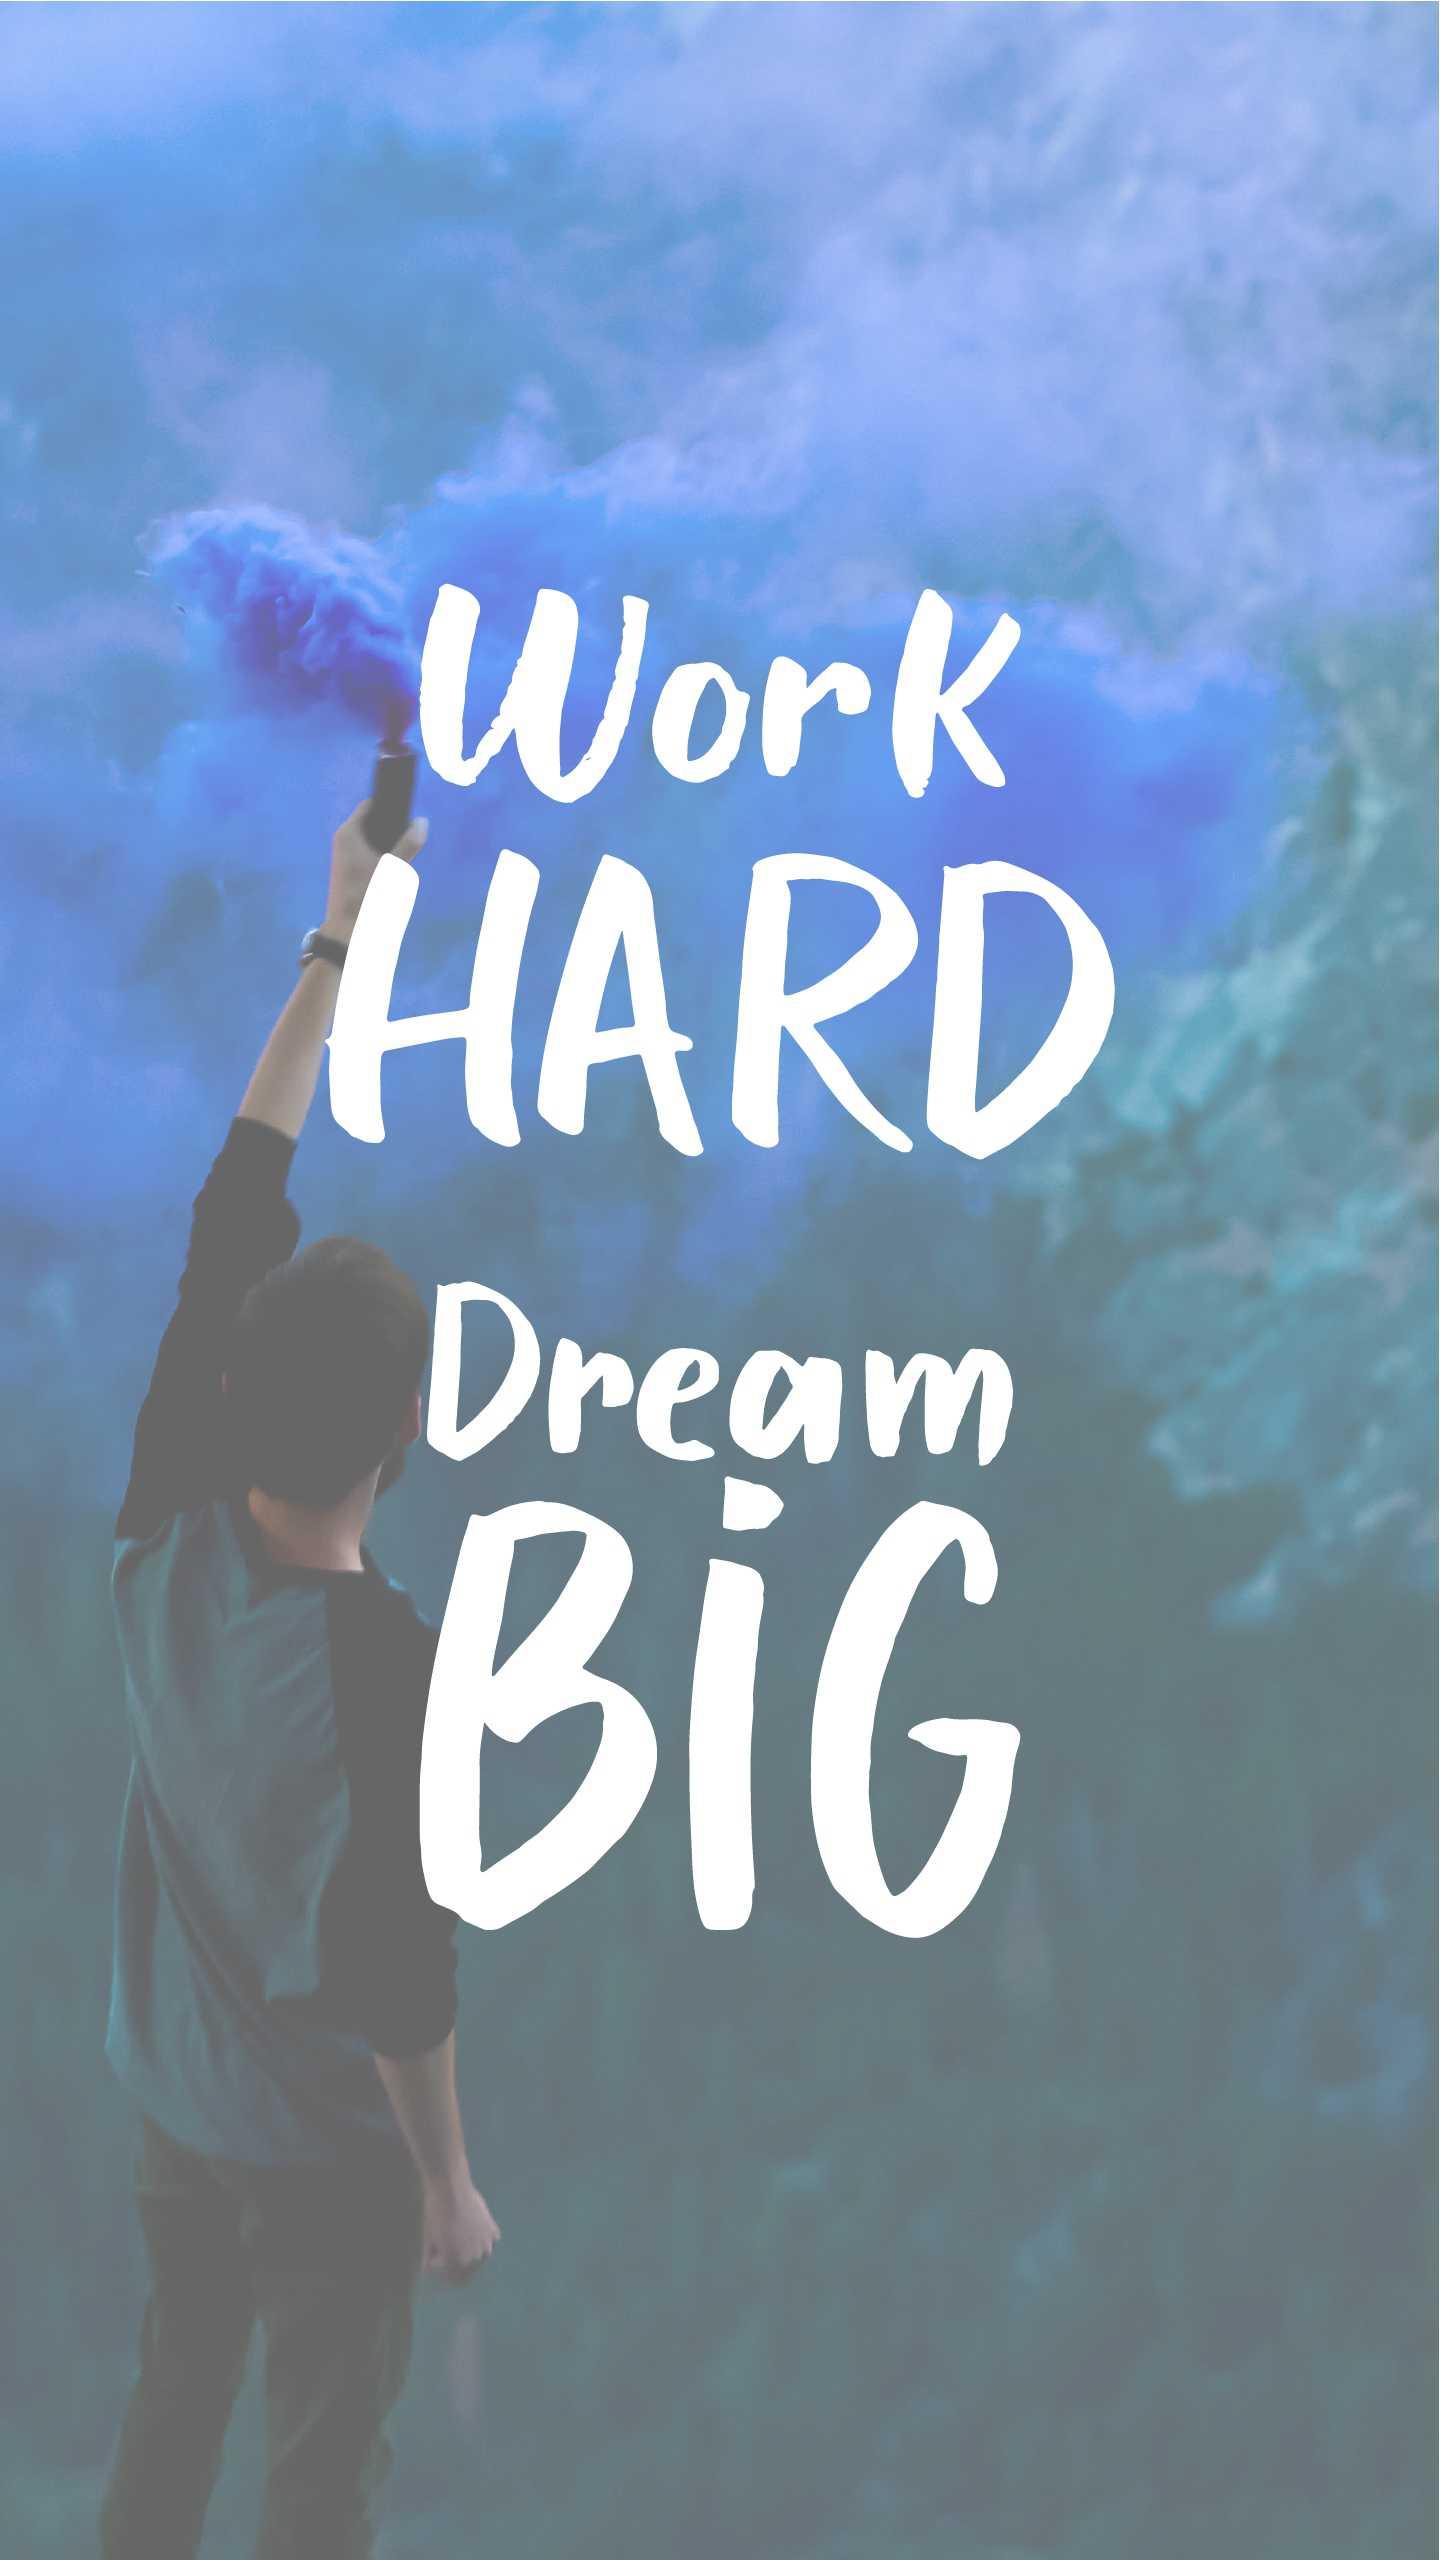 Work hard dream big iPhone Wallpaper